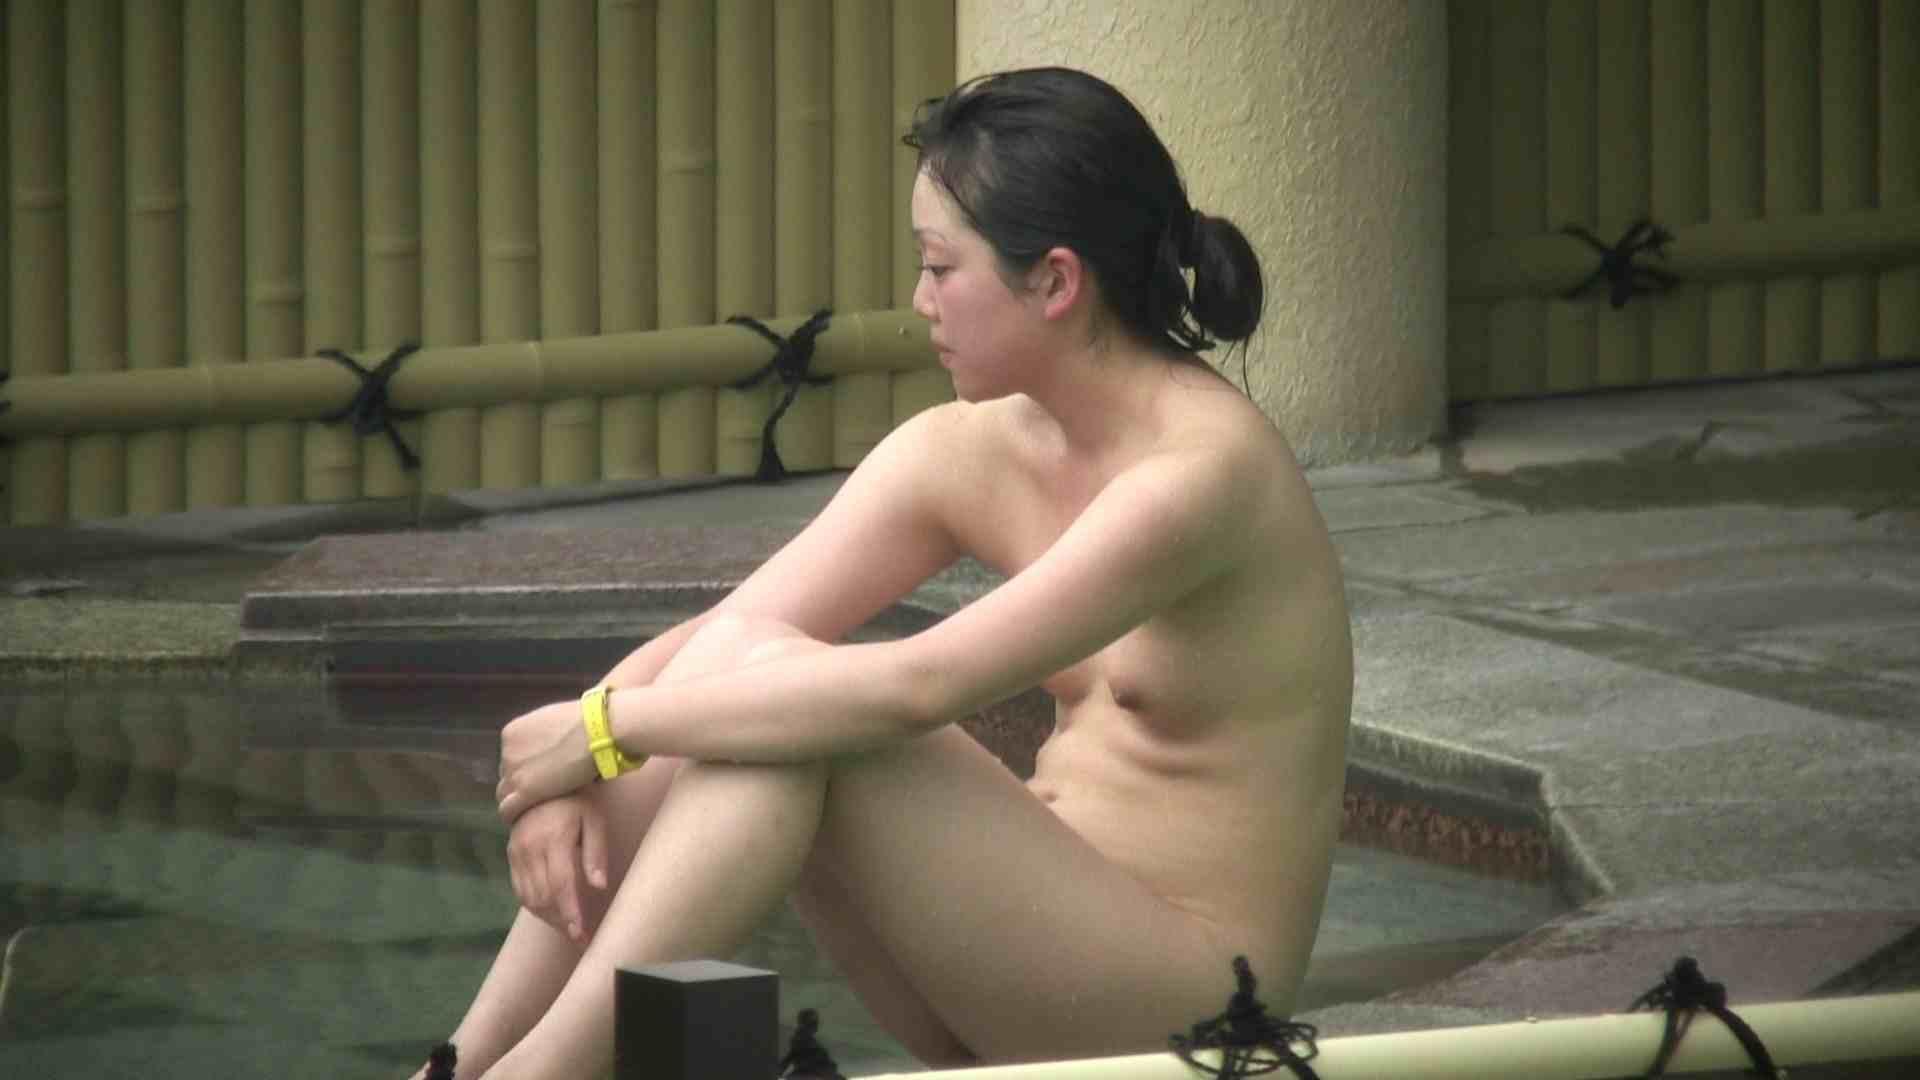 Aquaな露天風呂Vol.126 盗撮シリーズ | 露天風呂編  103PIX 11